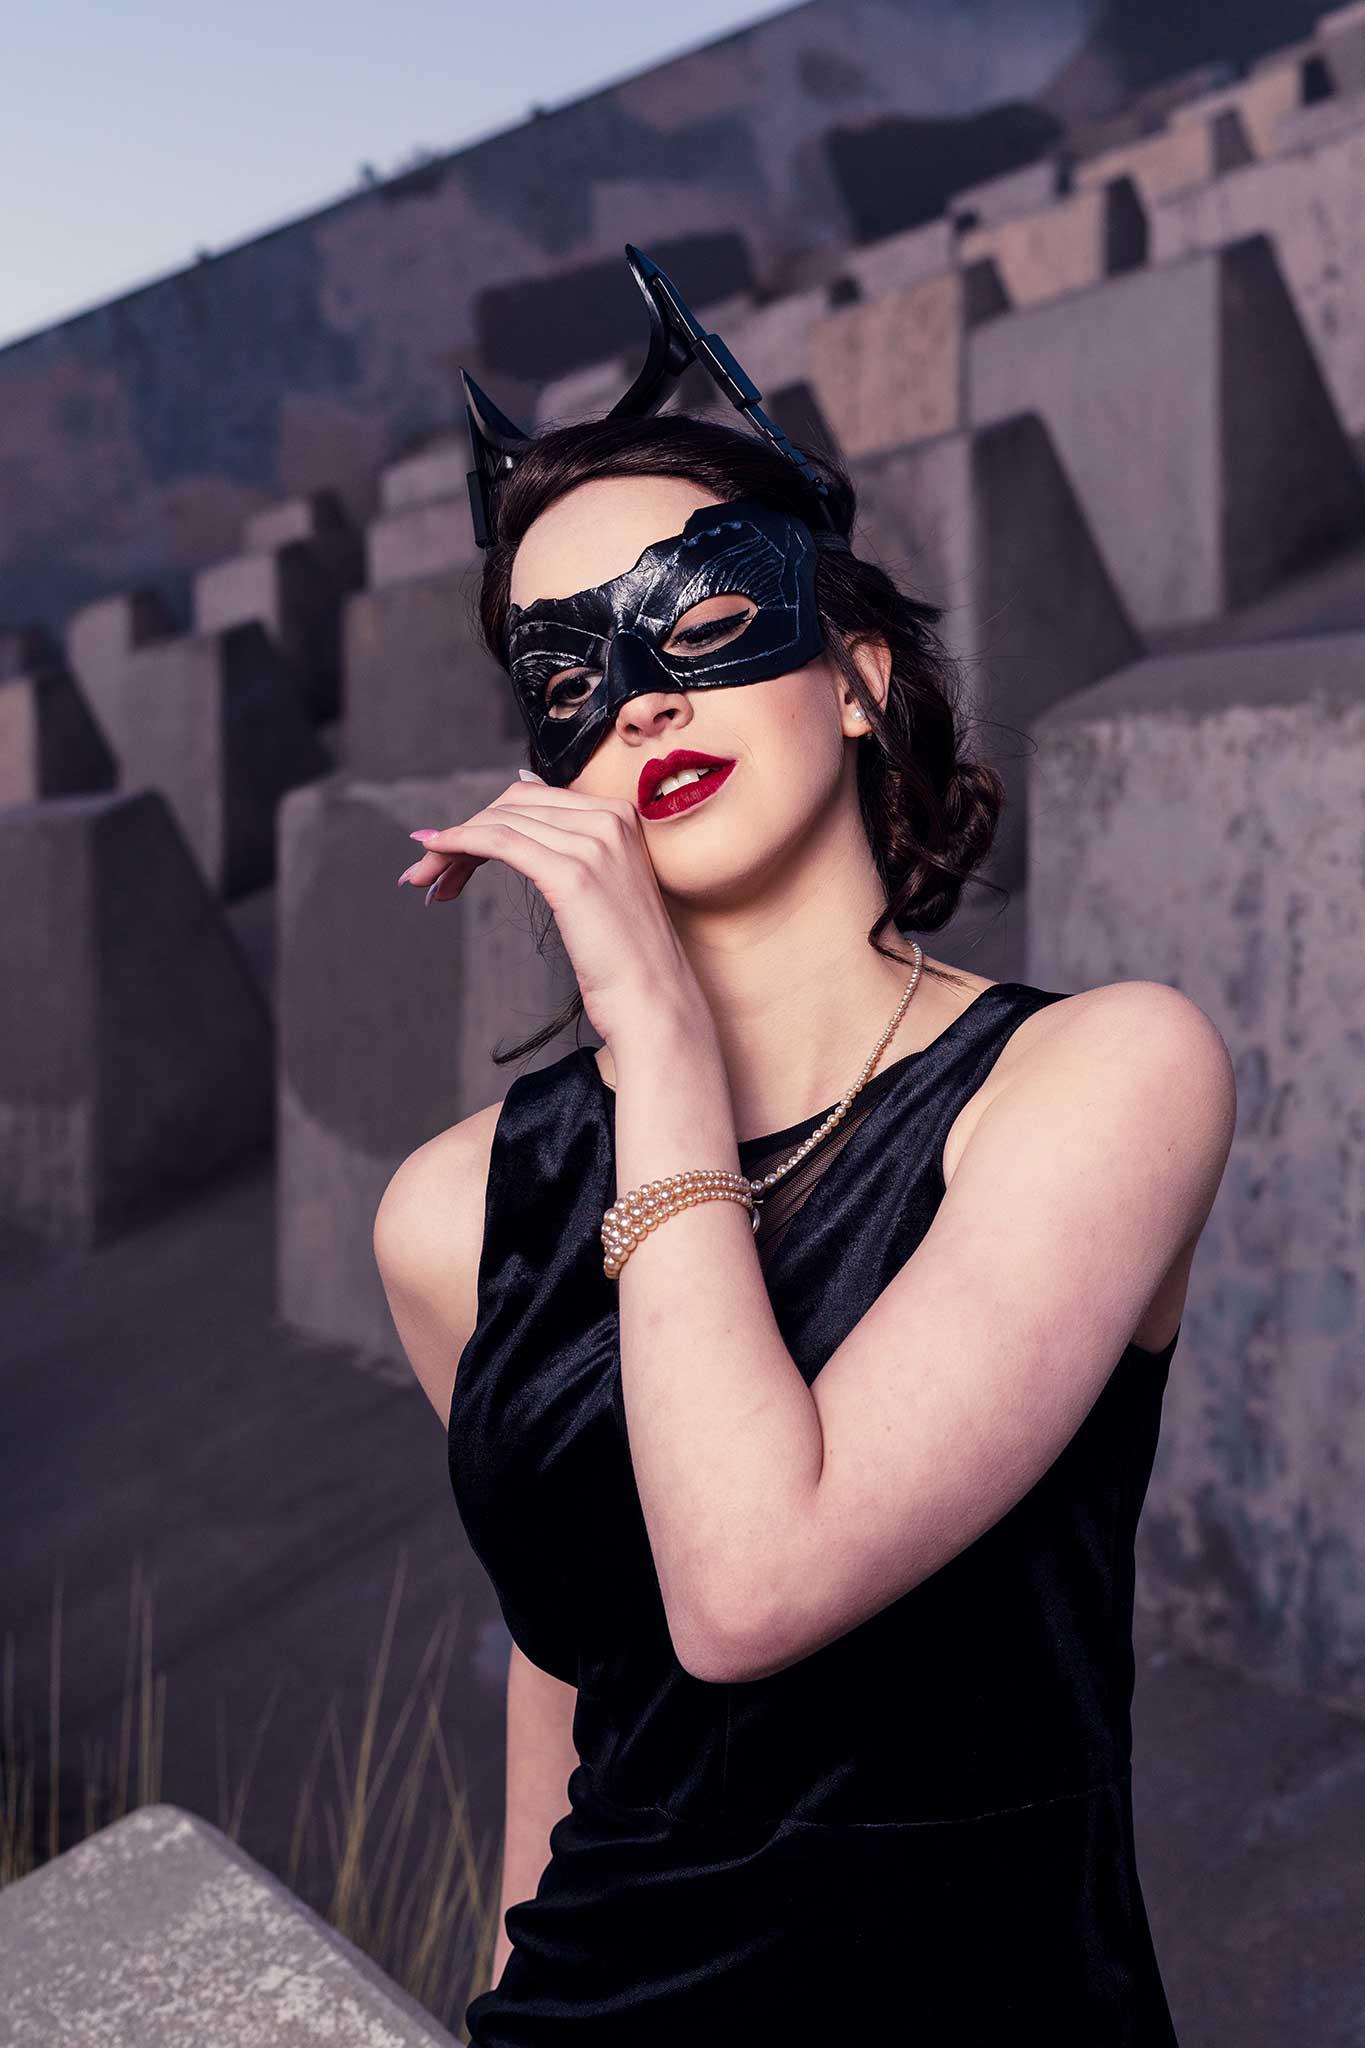 08-BYI_Catwoman_Irene.jpg